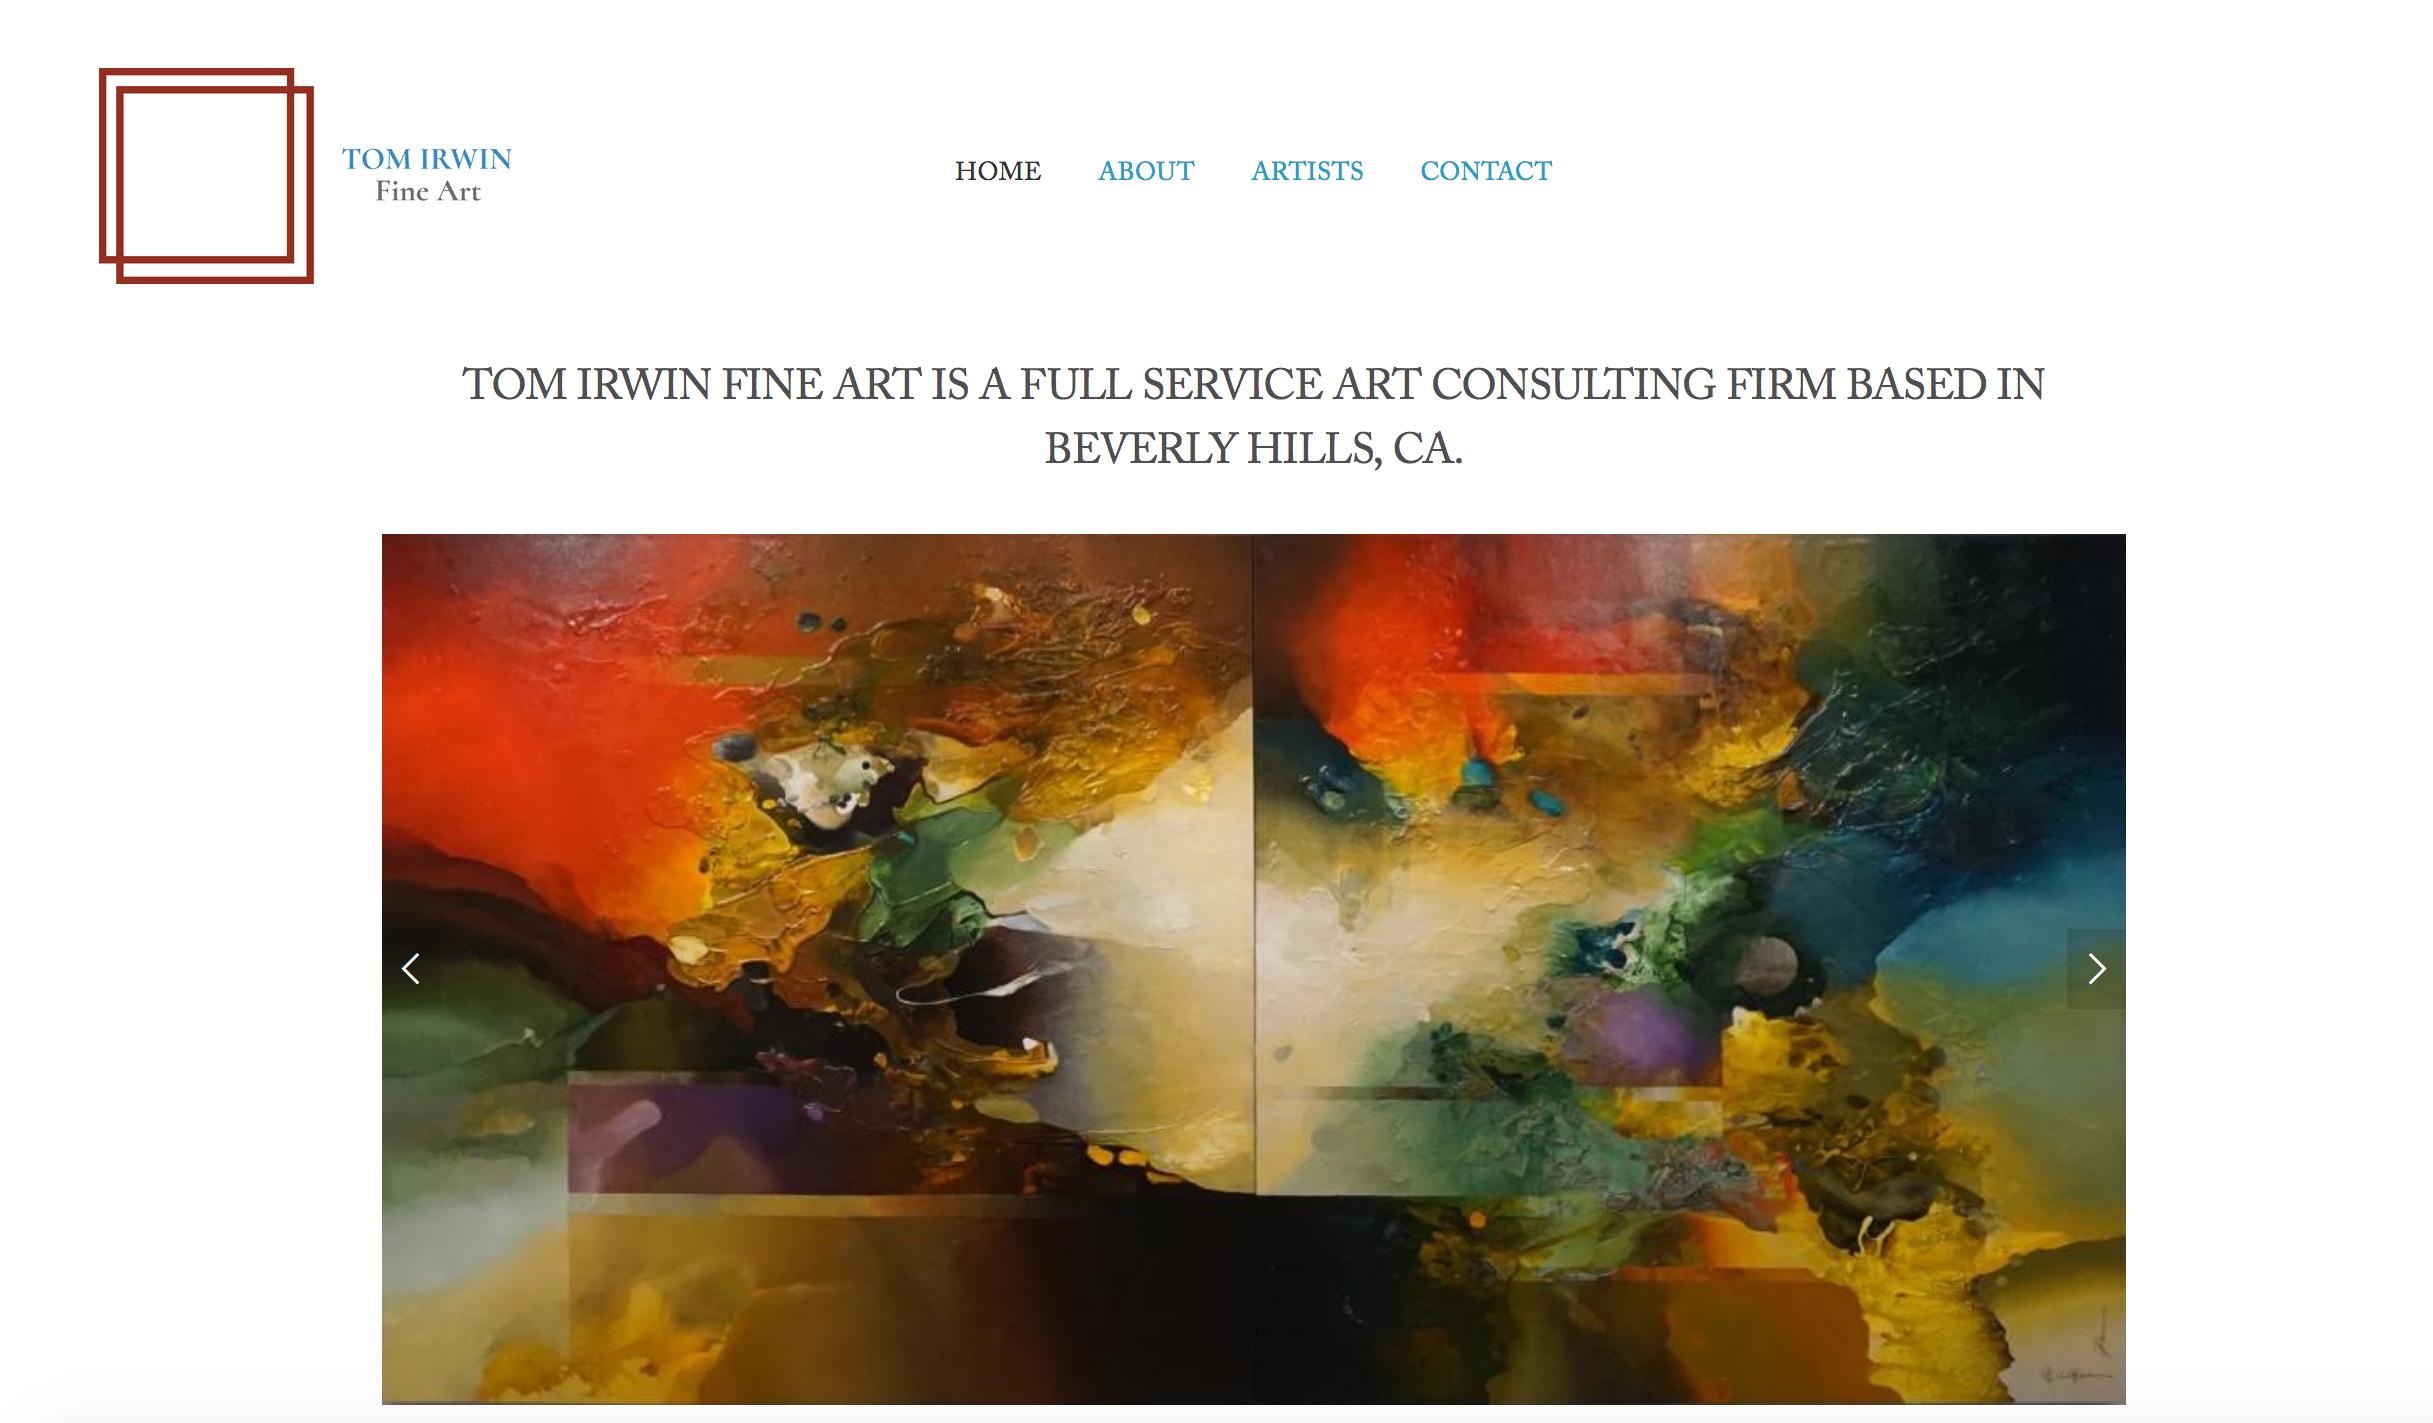 Tom Irwin Fine Art, Beverly Hills, CA